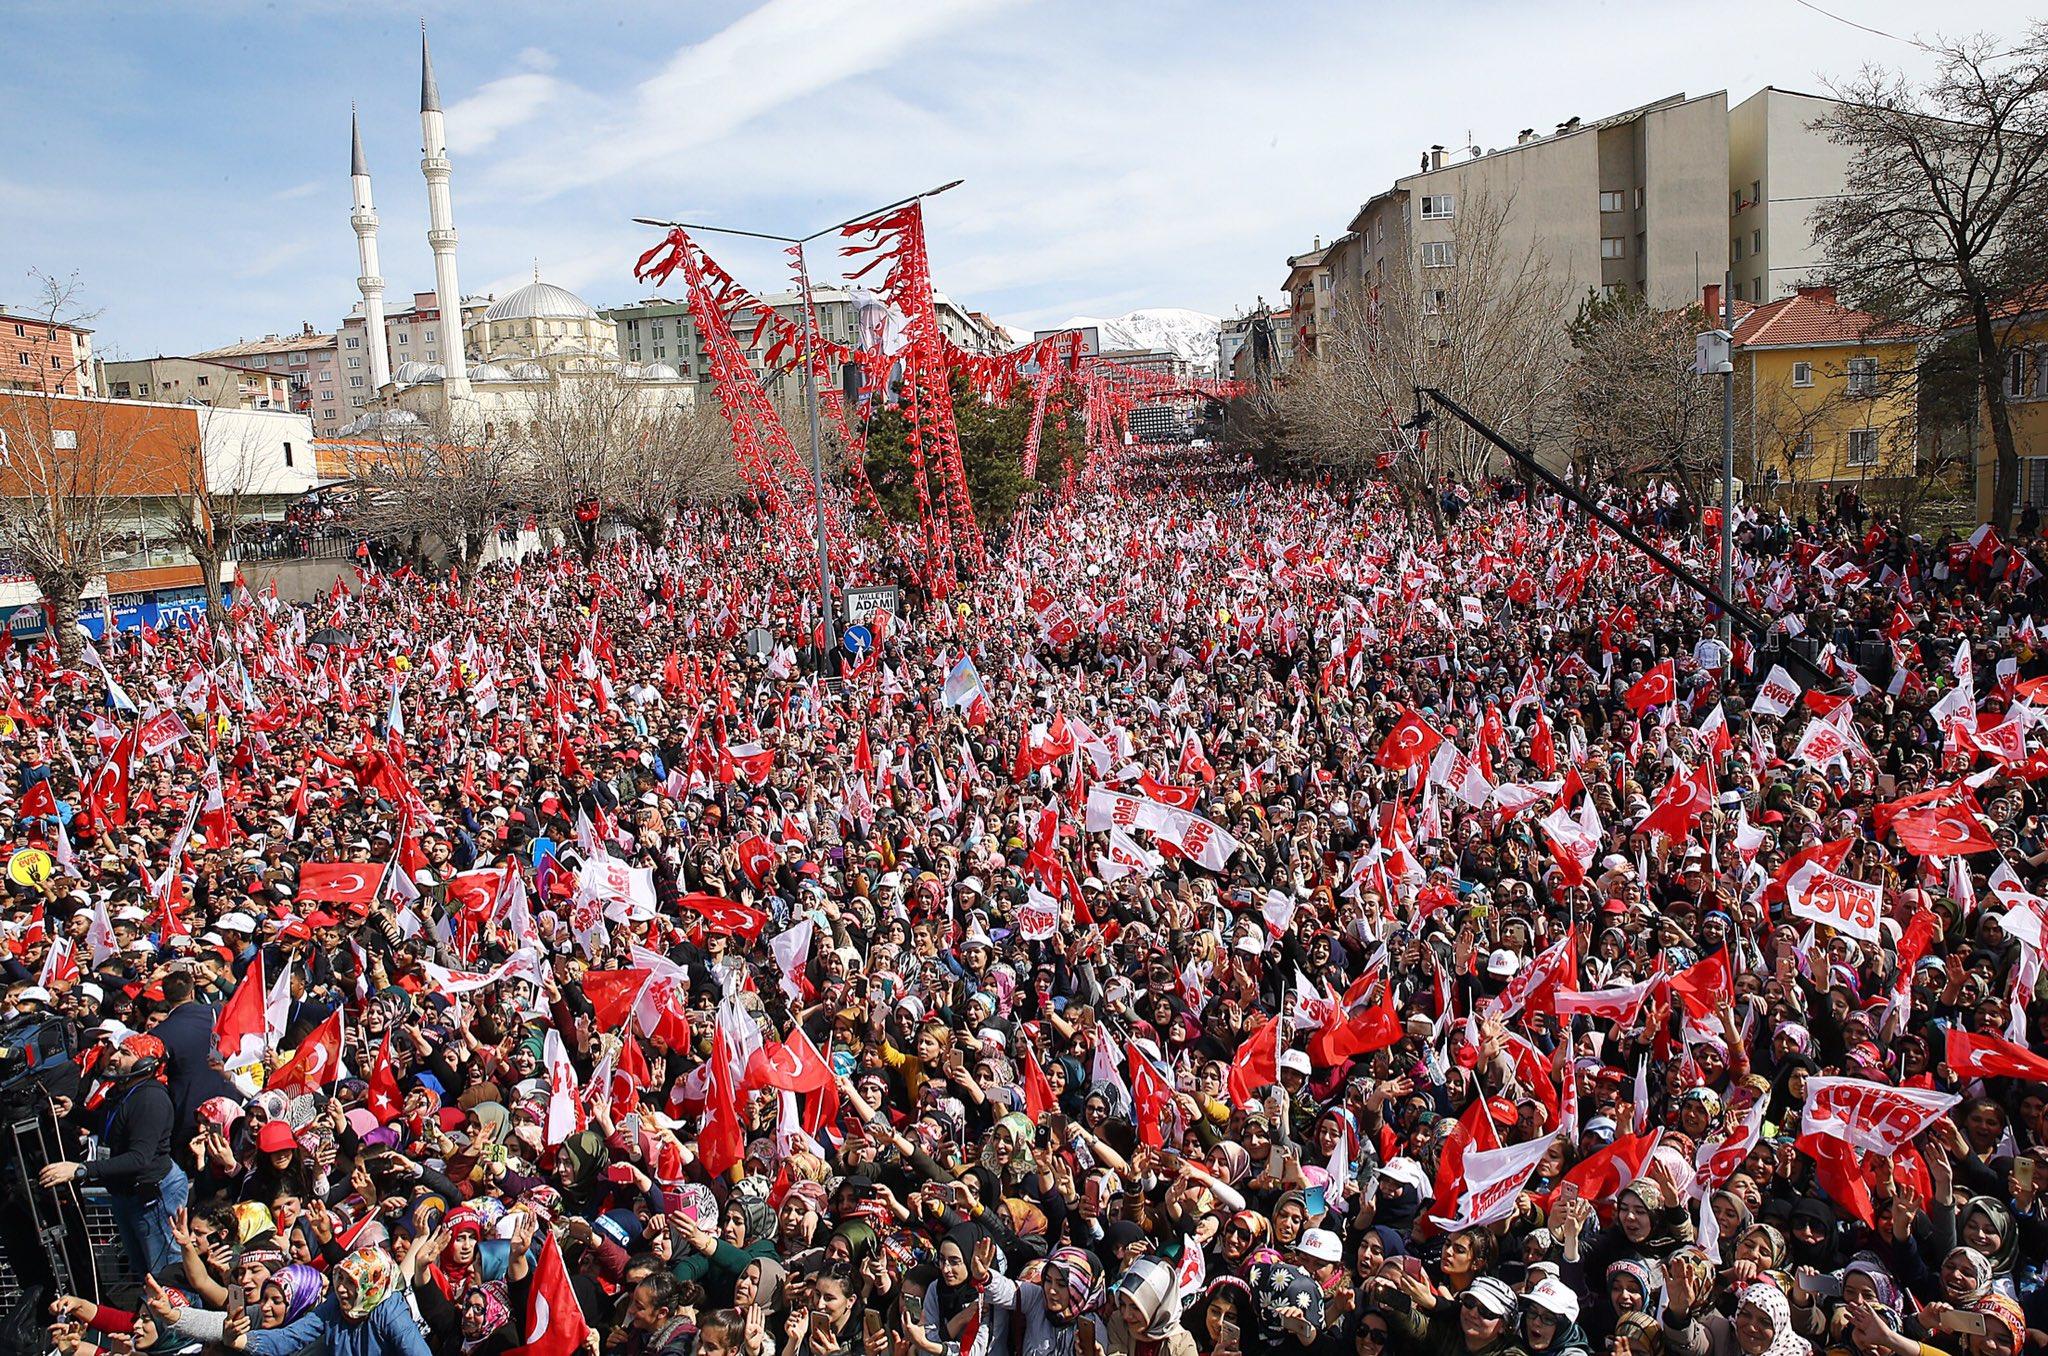 Teşekkürler Erzurum! https://t.co/4kEJMMfPLk